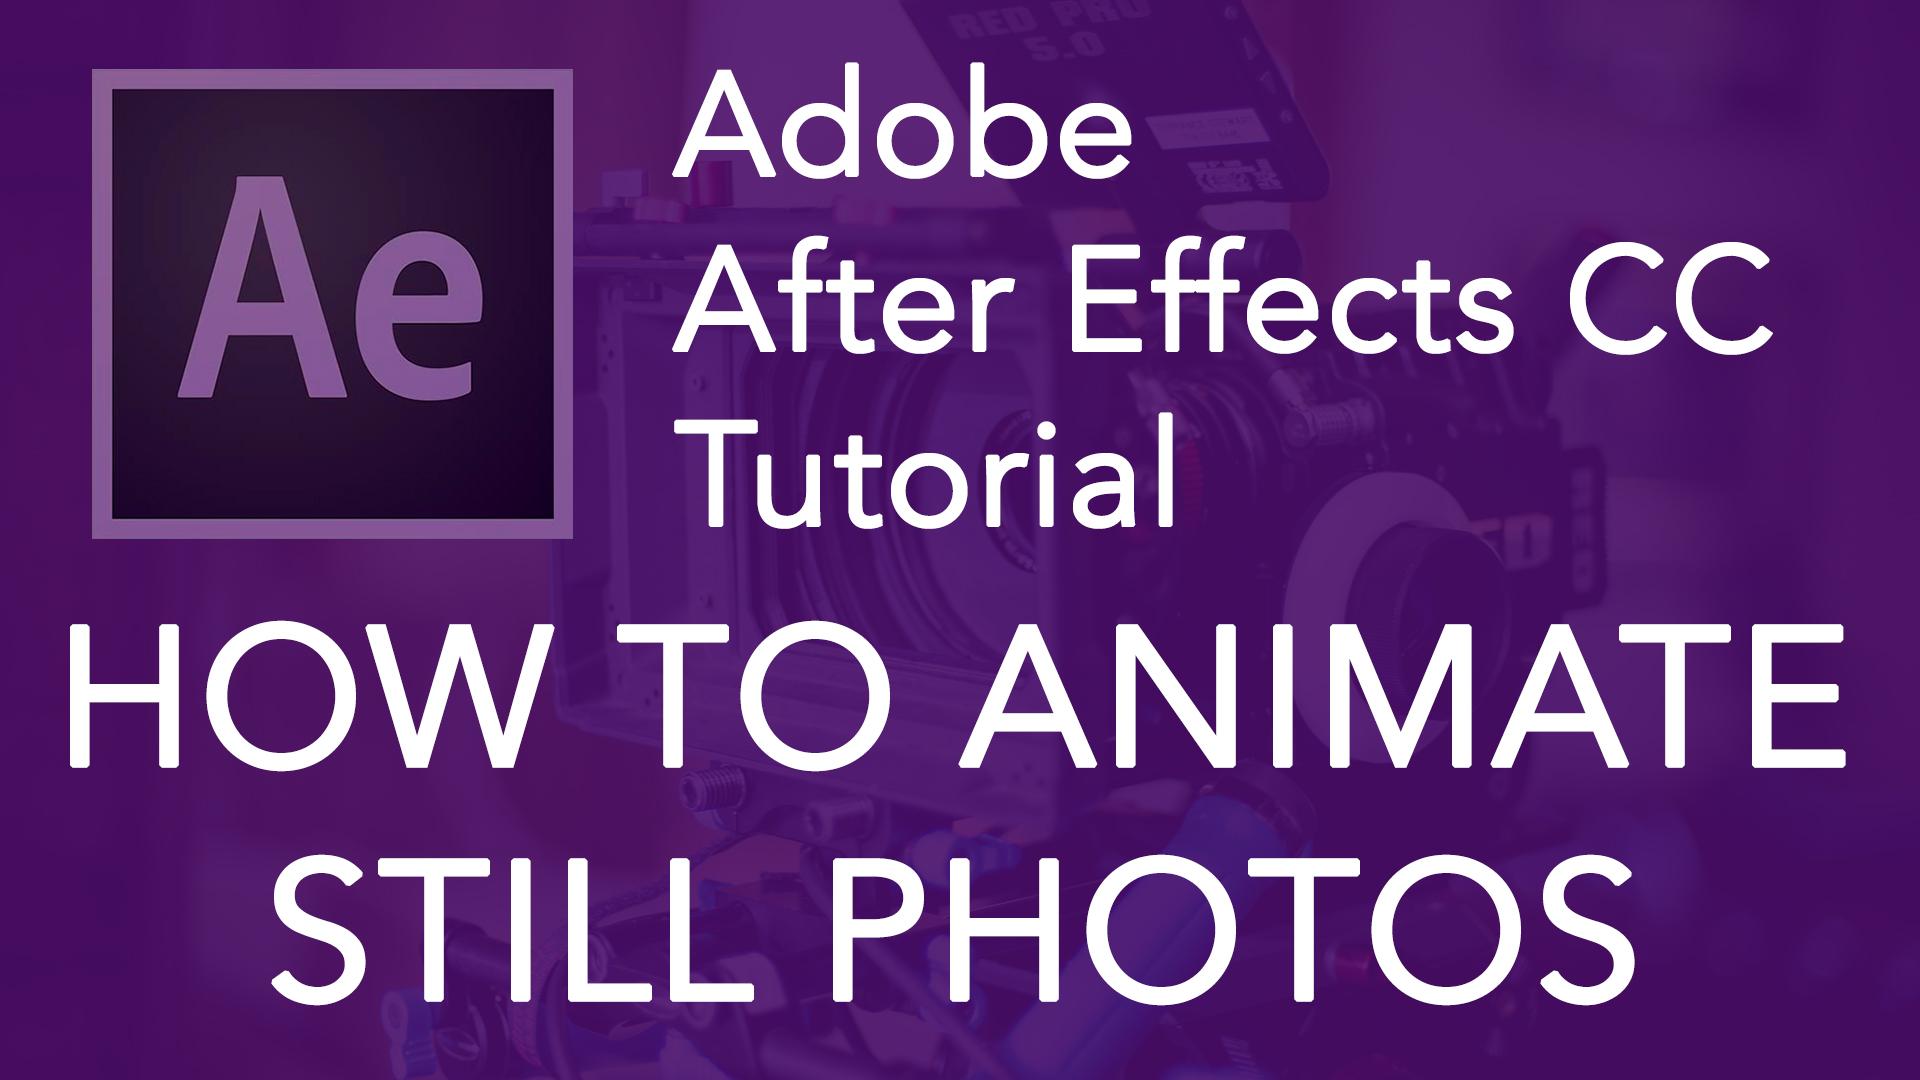 How to Animate Still Photos